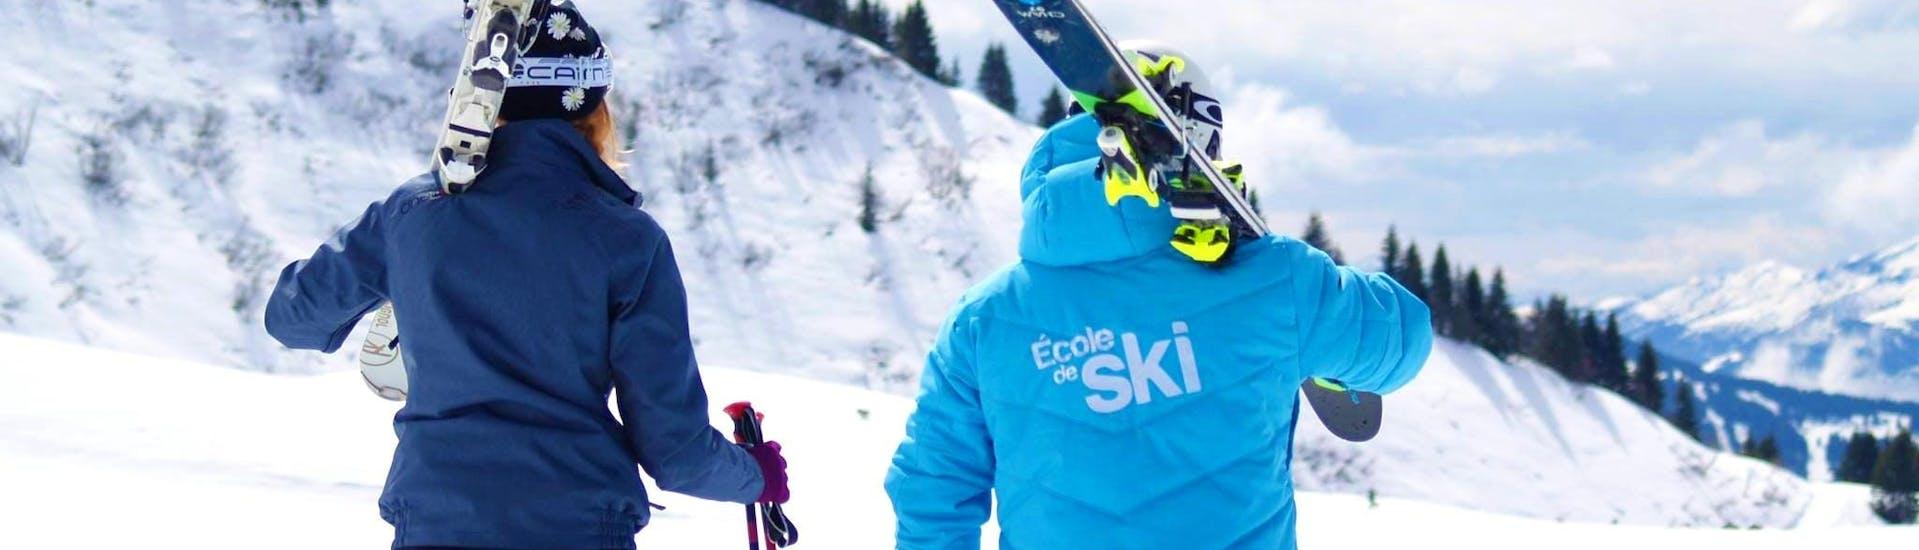 adult-ski-lessons-first-timers-low-season-easy2ride-avoriaz-hero